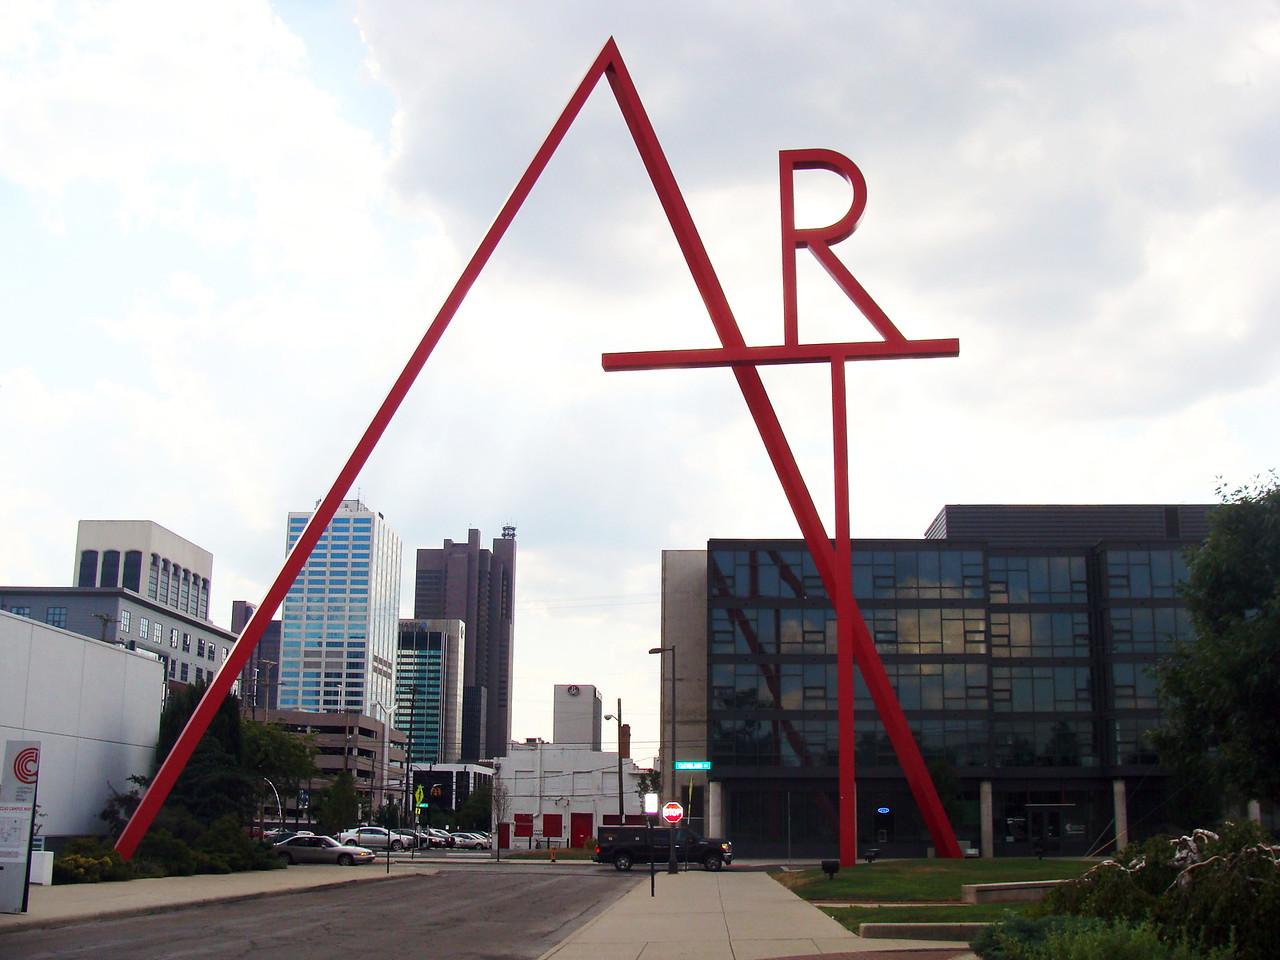 Big Red Art Sculpture